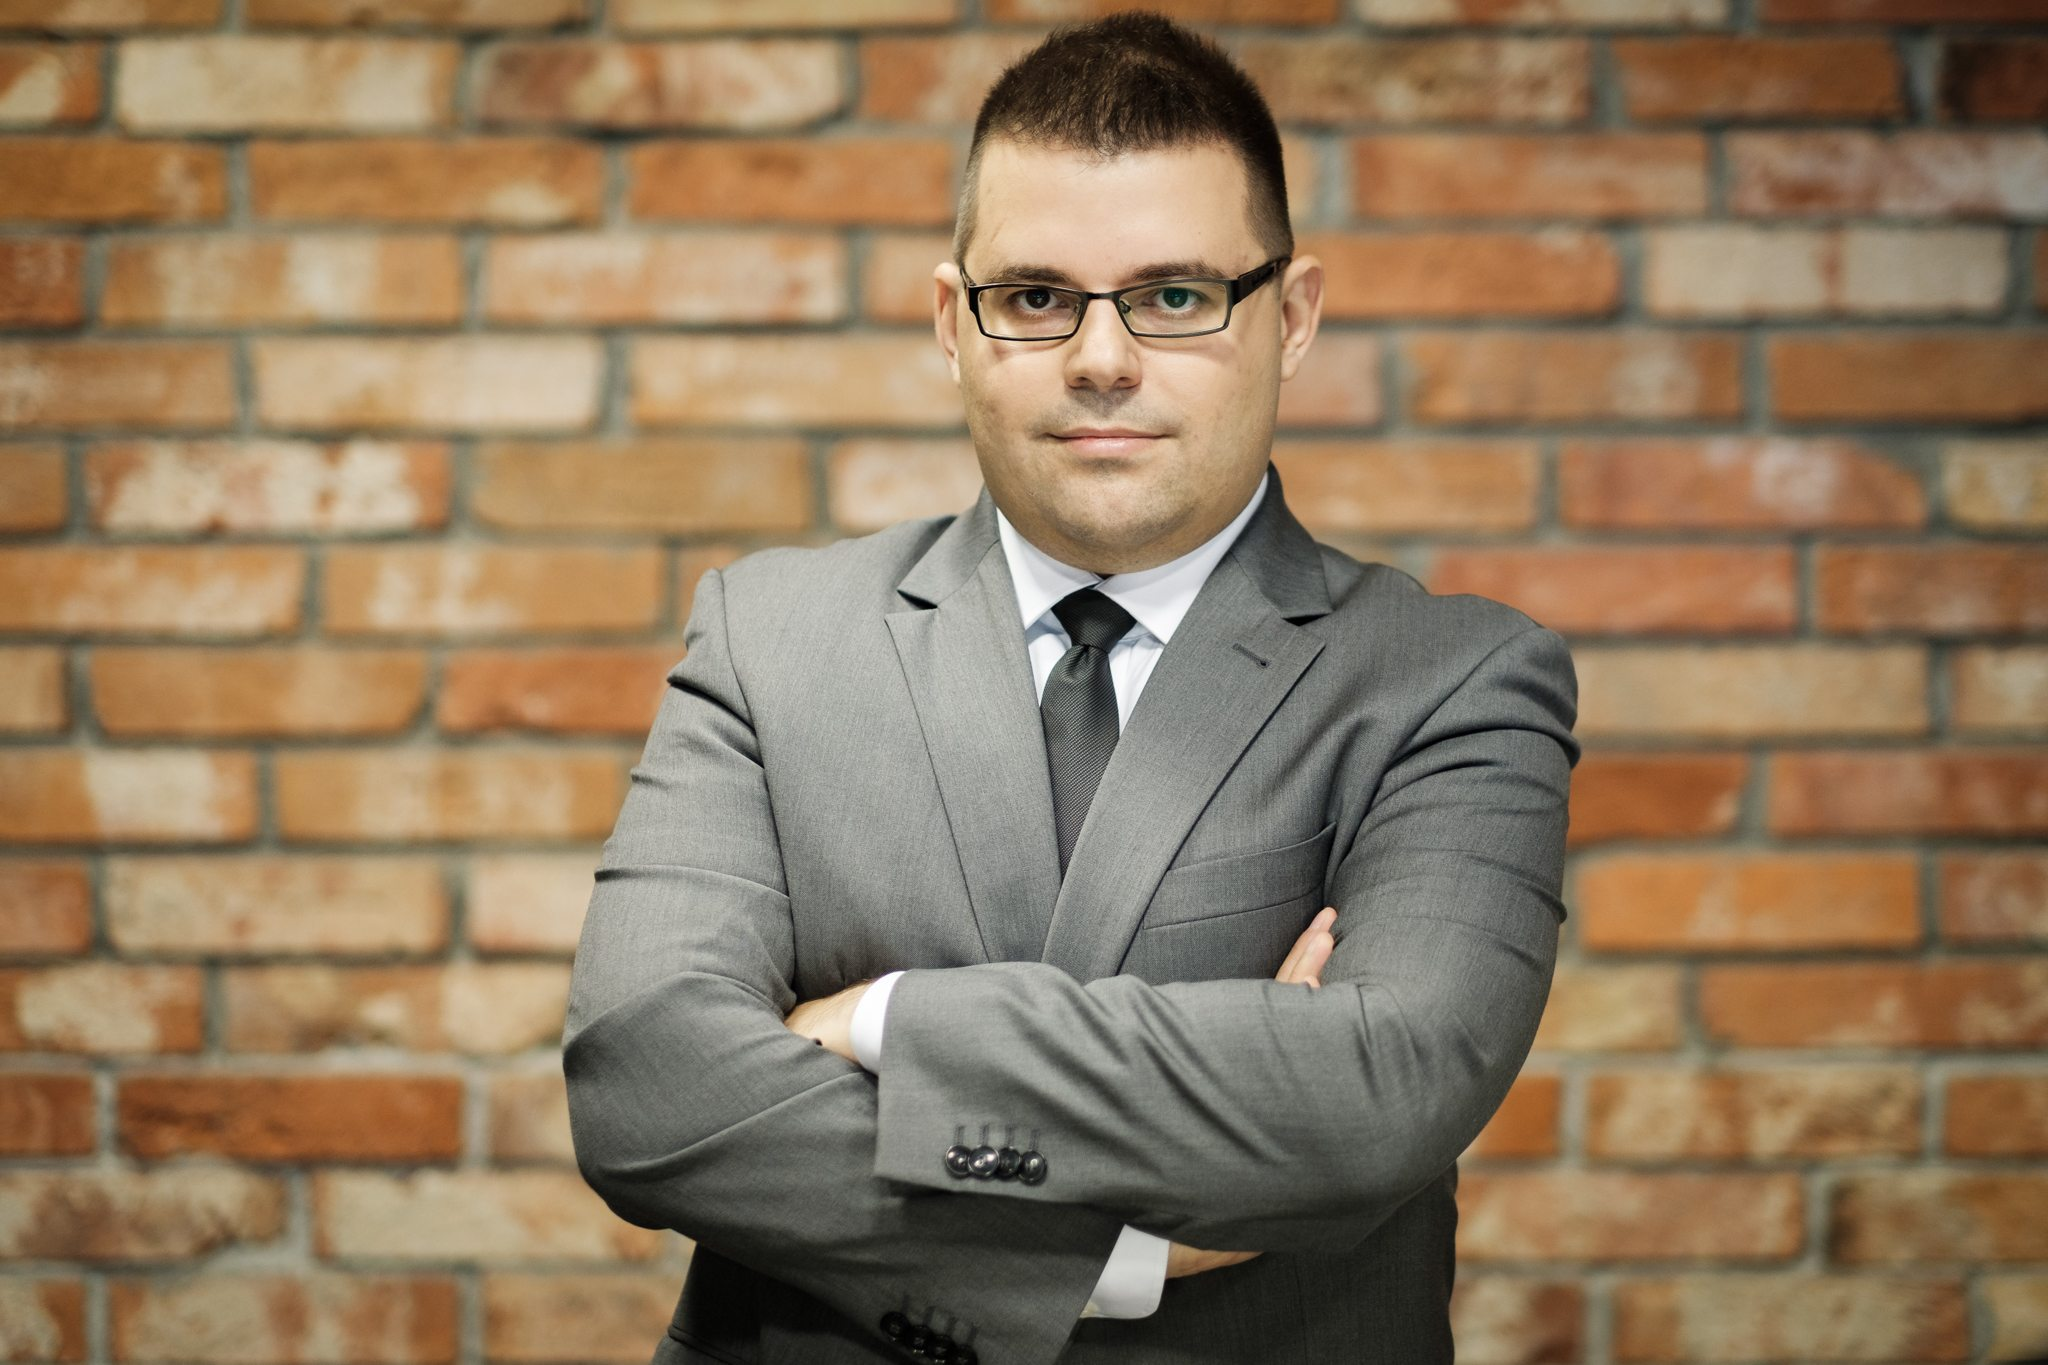 Piotr Piasecki